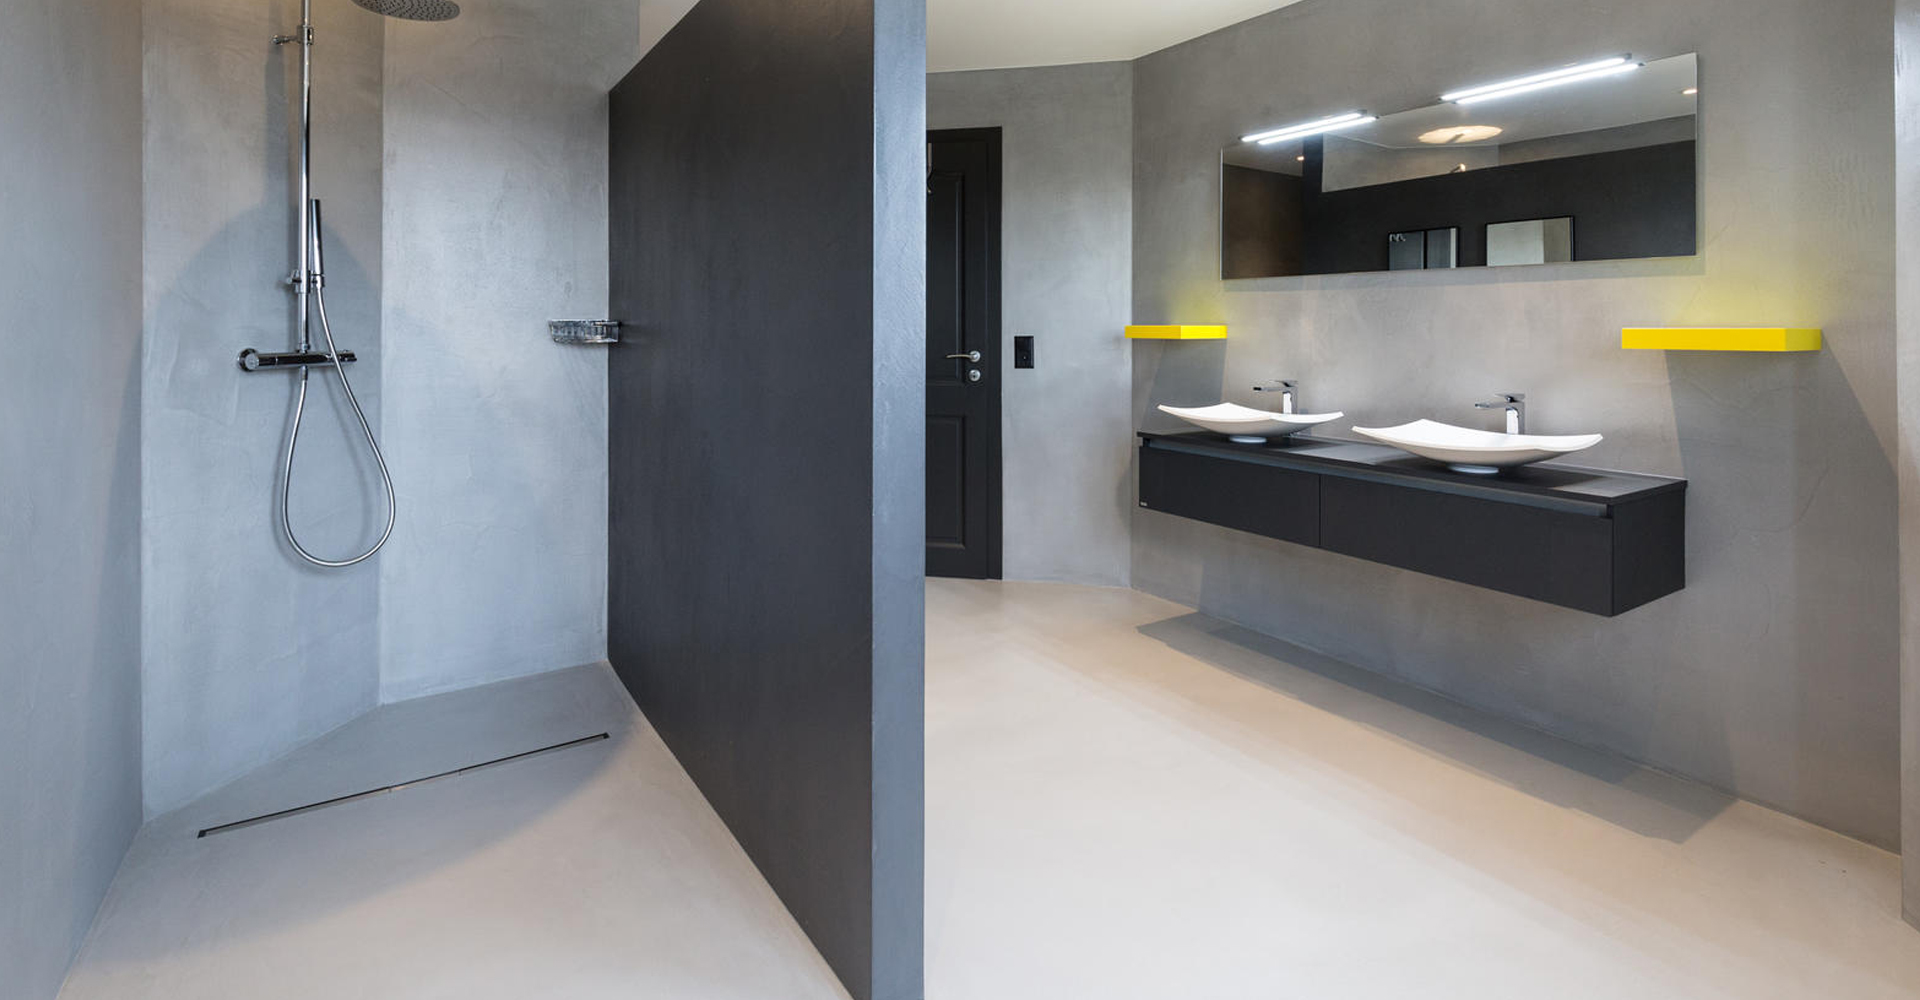 Beton cire wanden badkamer